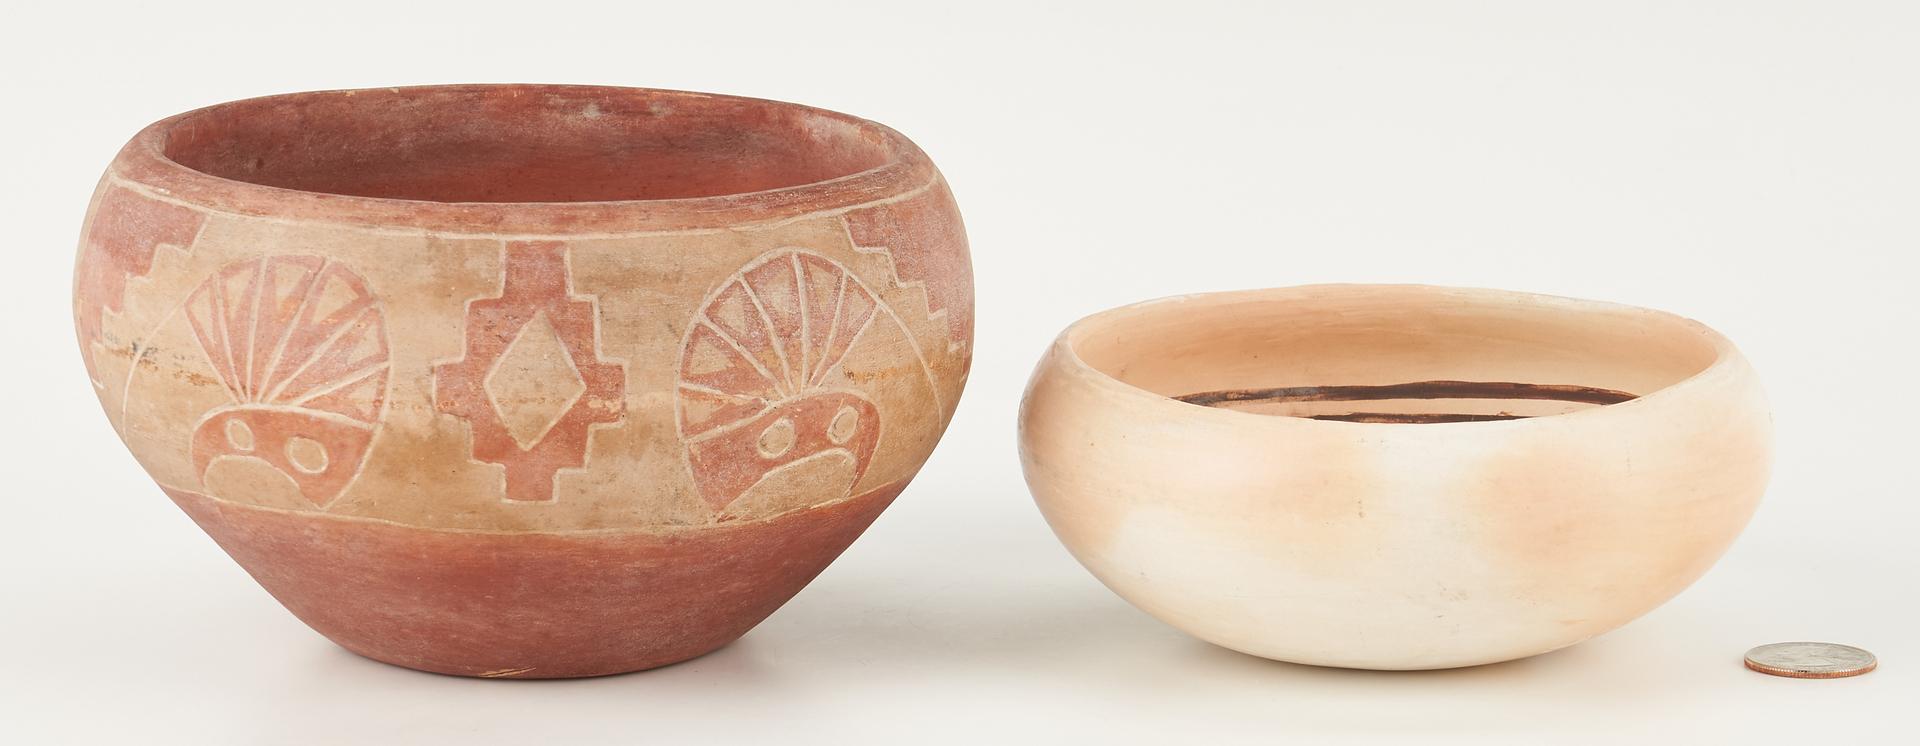 Lot 1107: 2 Native American Southwest Pottery Bowls